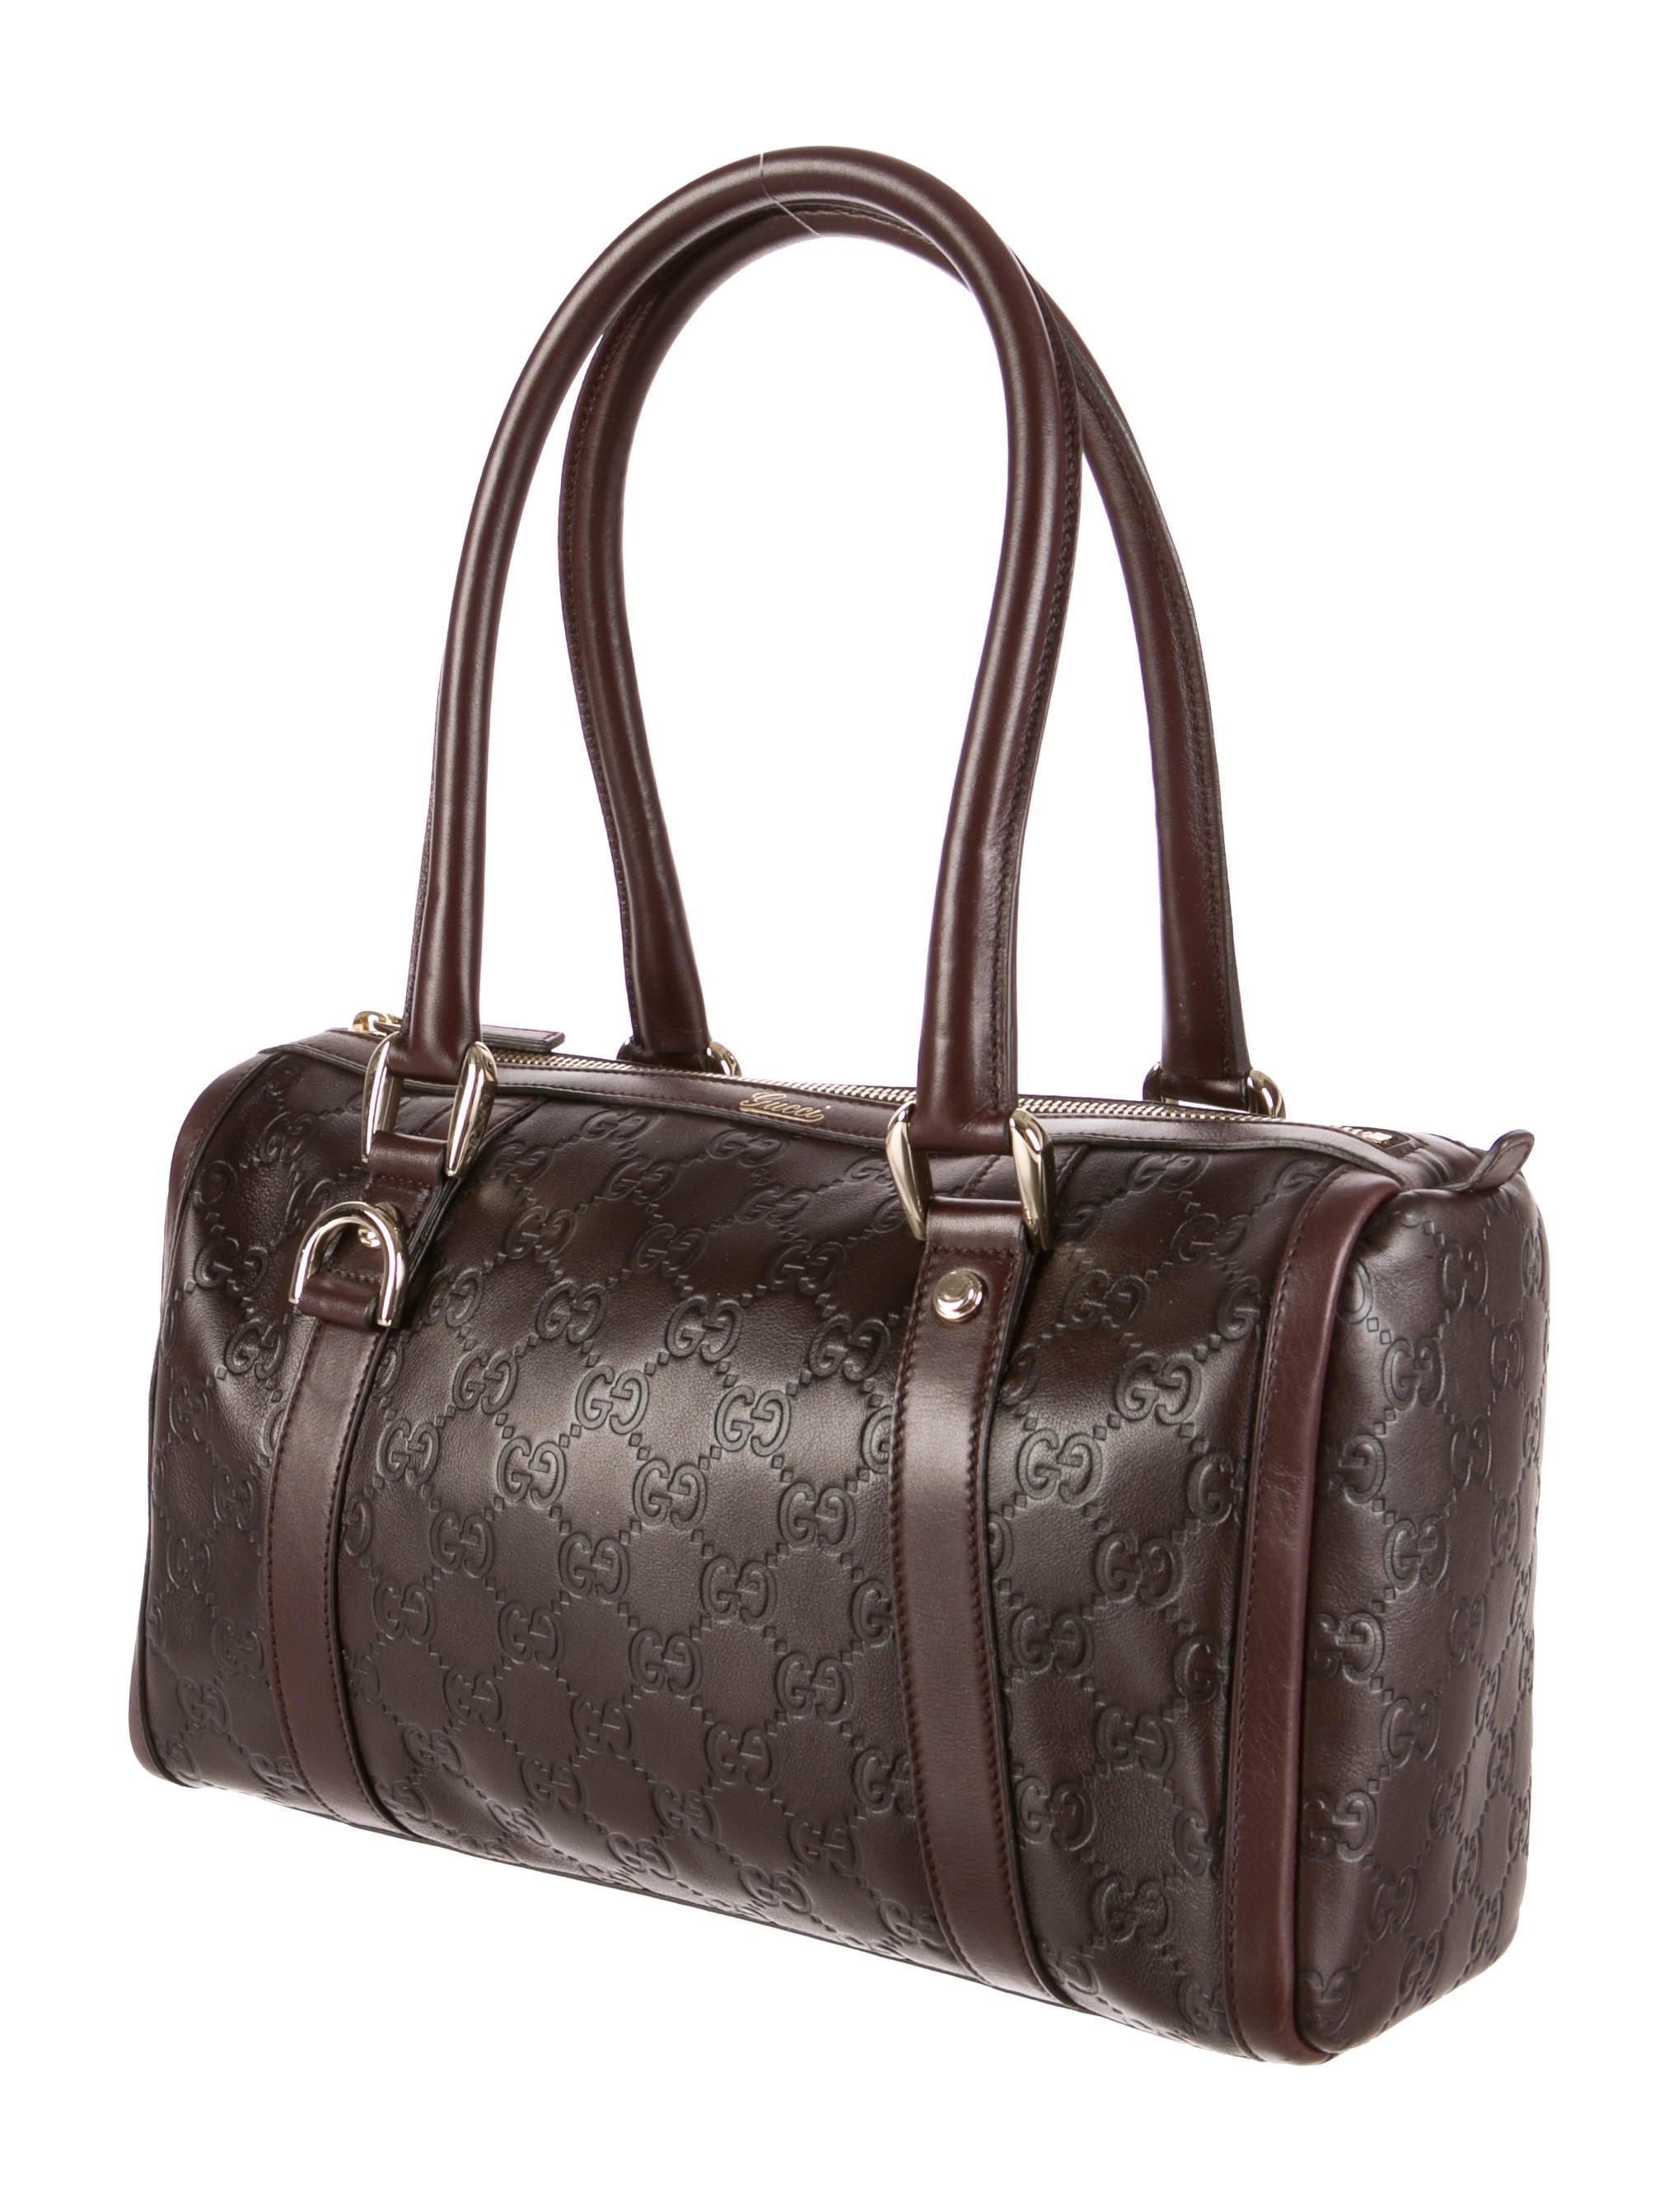 Boston Bag Patchwork Tutorial: Gucci Guccissima Boston Bag - Handbags - GUC76669